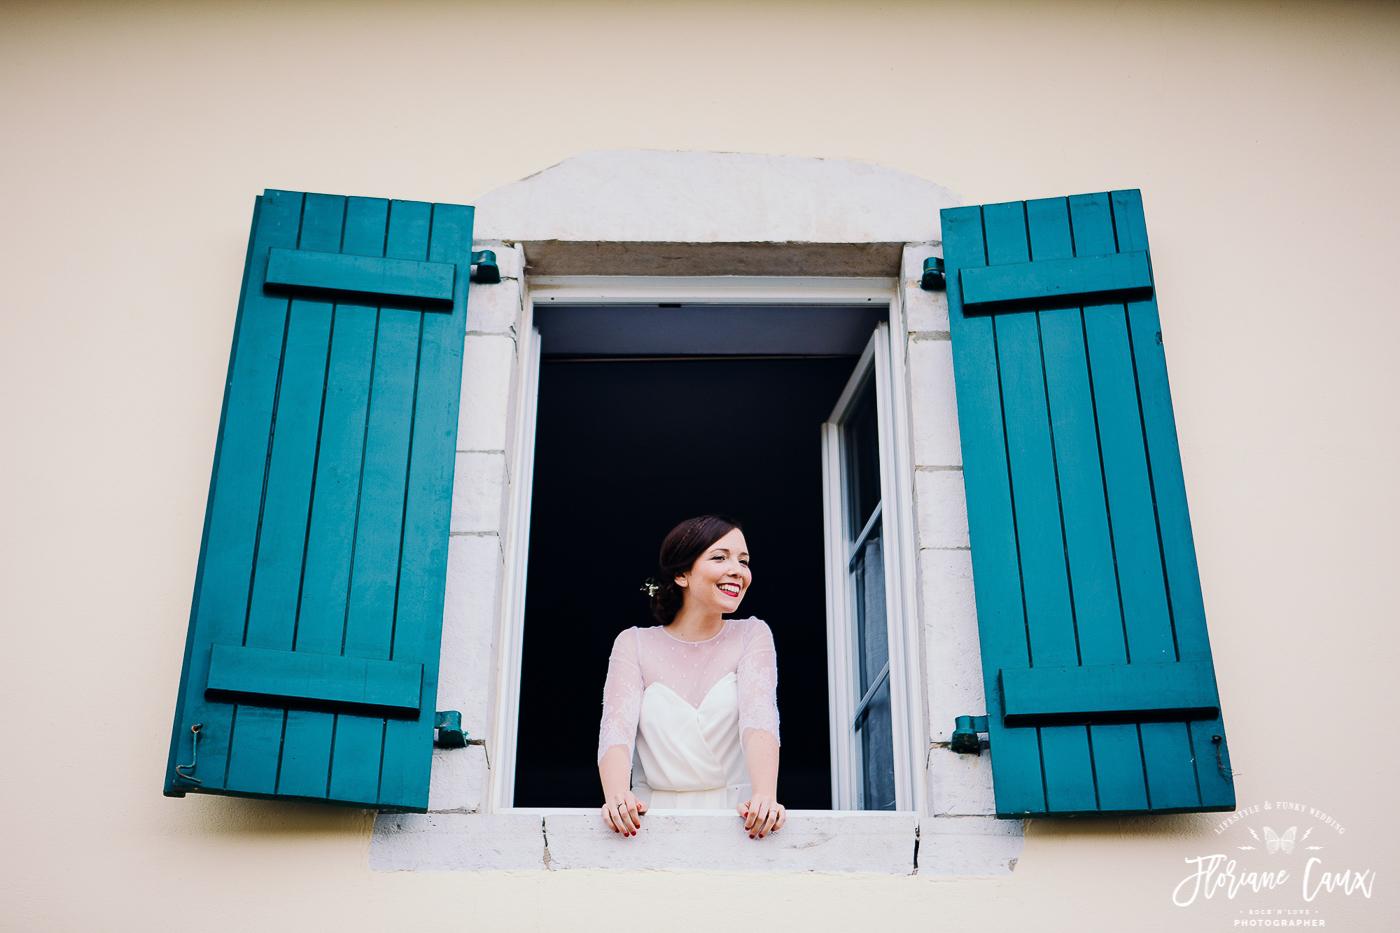 photographe-mariage-pays-basque-Floriane-Caux (14)